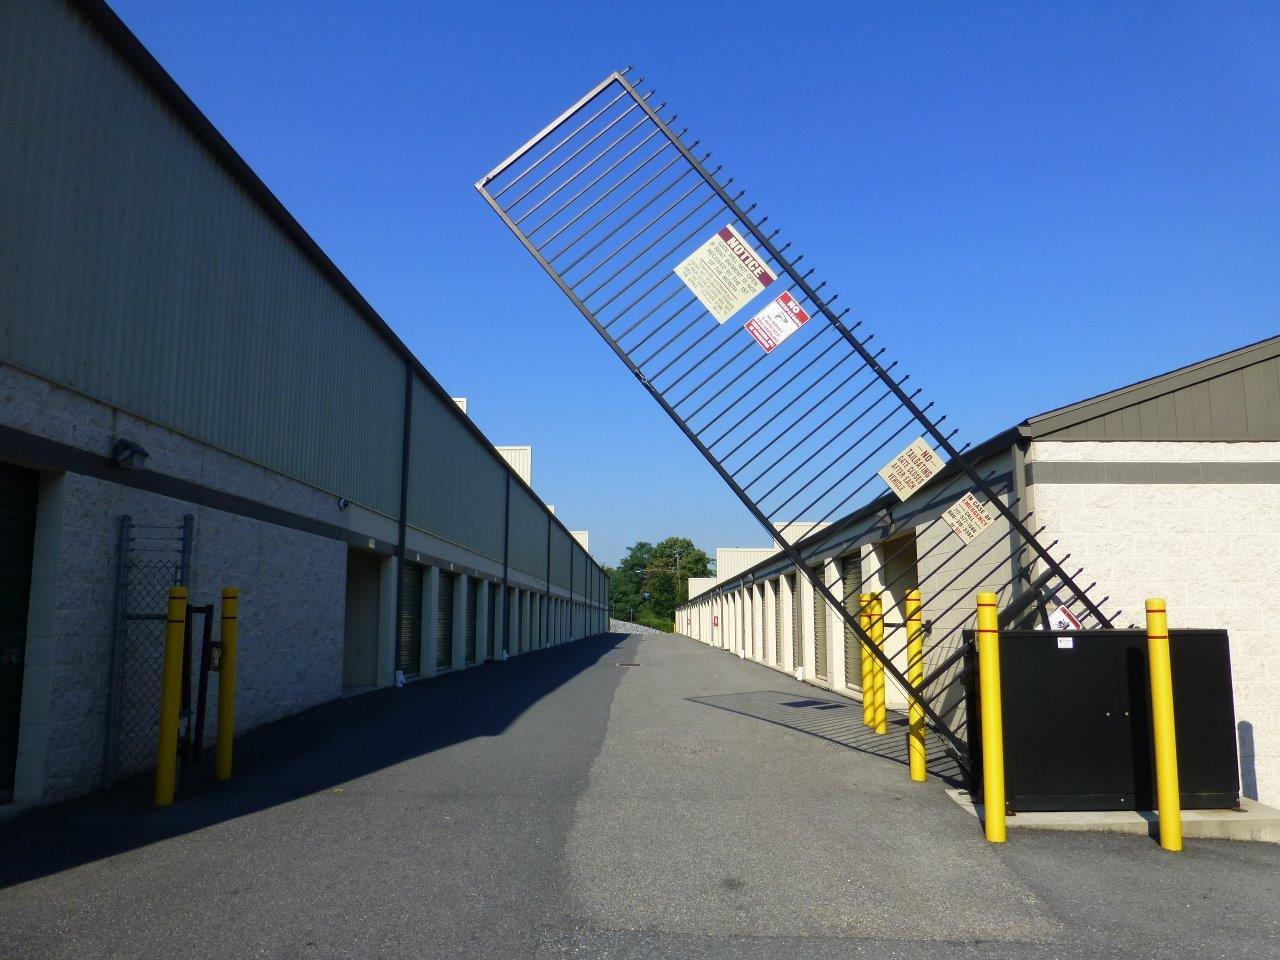 Best ideas about Vertical Pivot Gate . Save or Pin Vertical Pivot Gate Operators Manufacturer AutoGate Now.